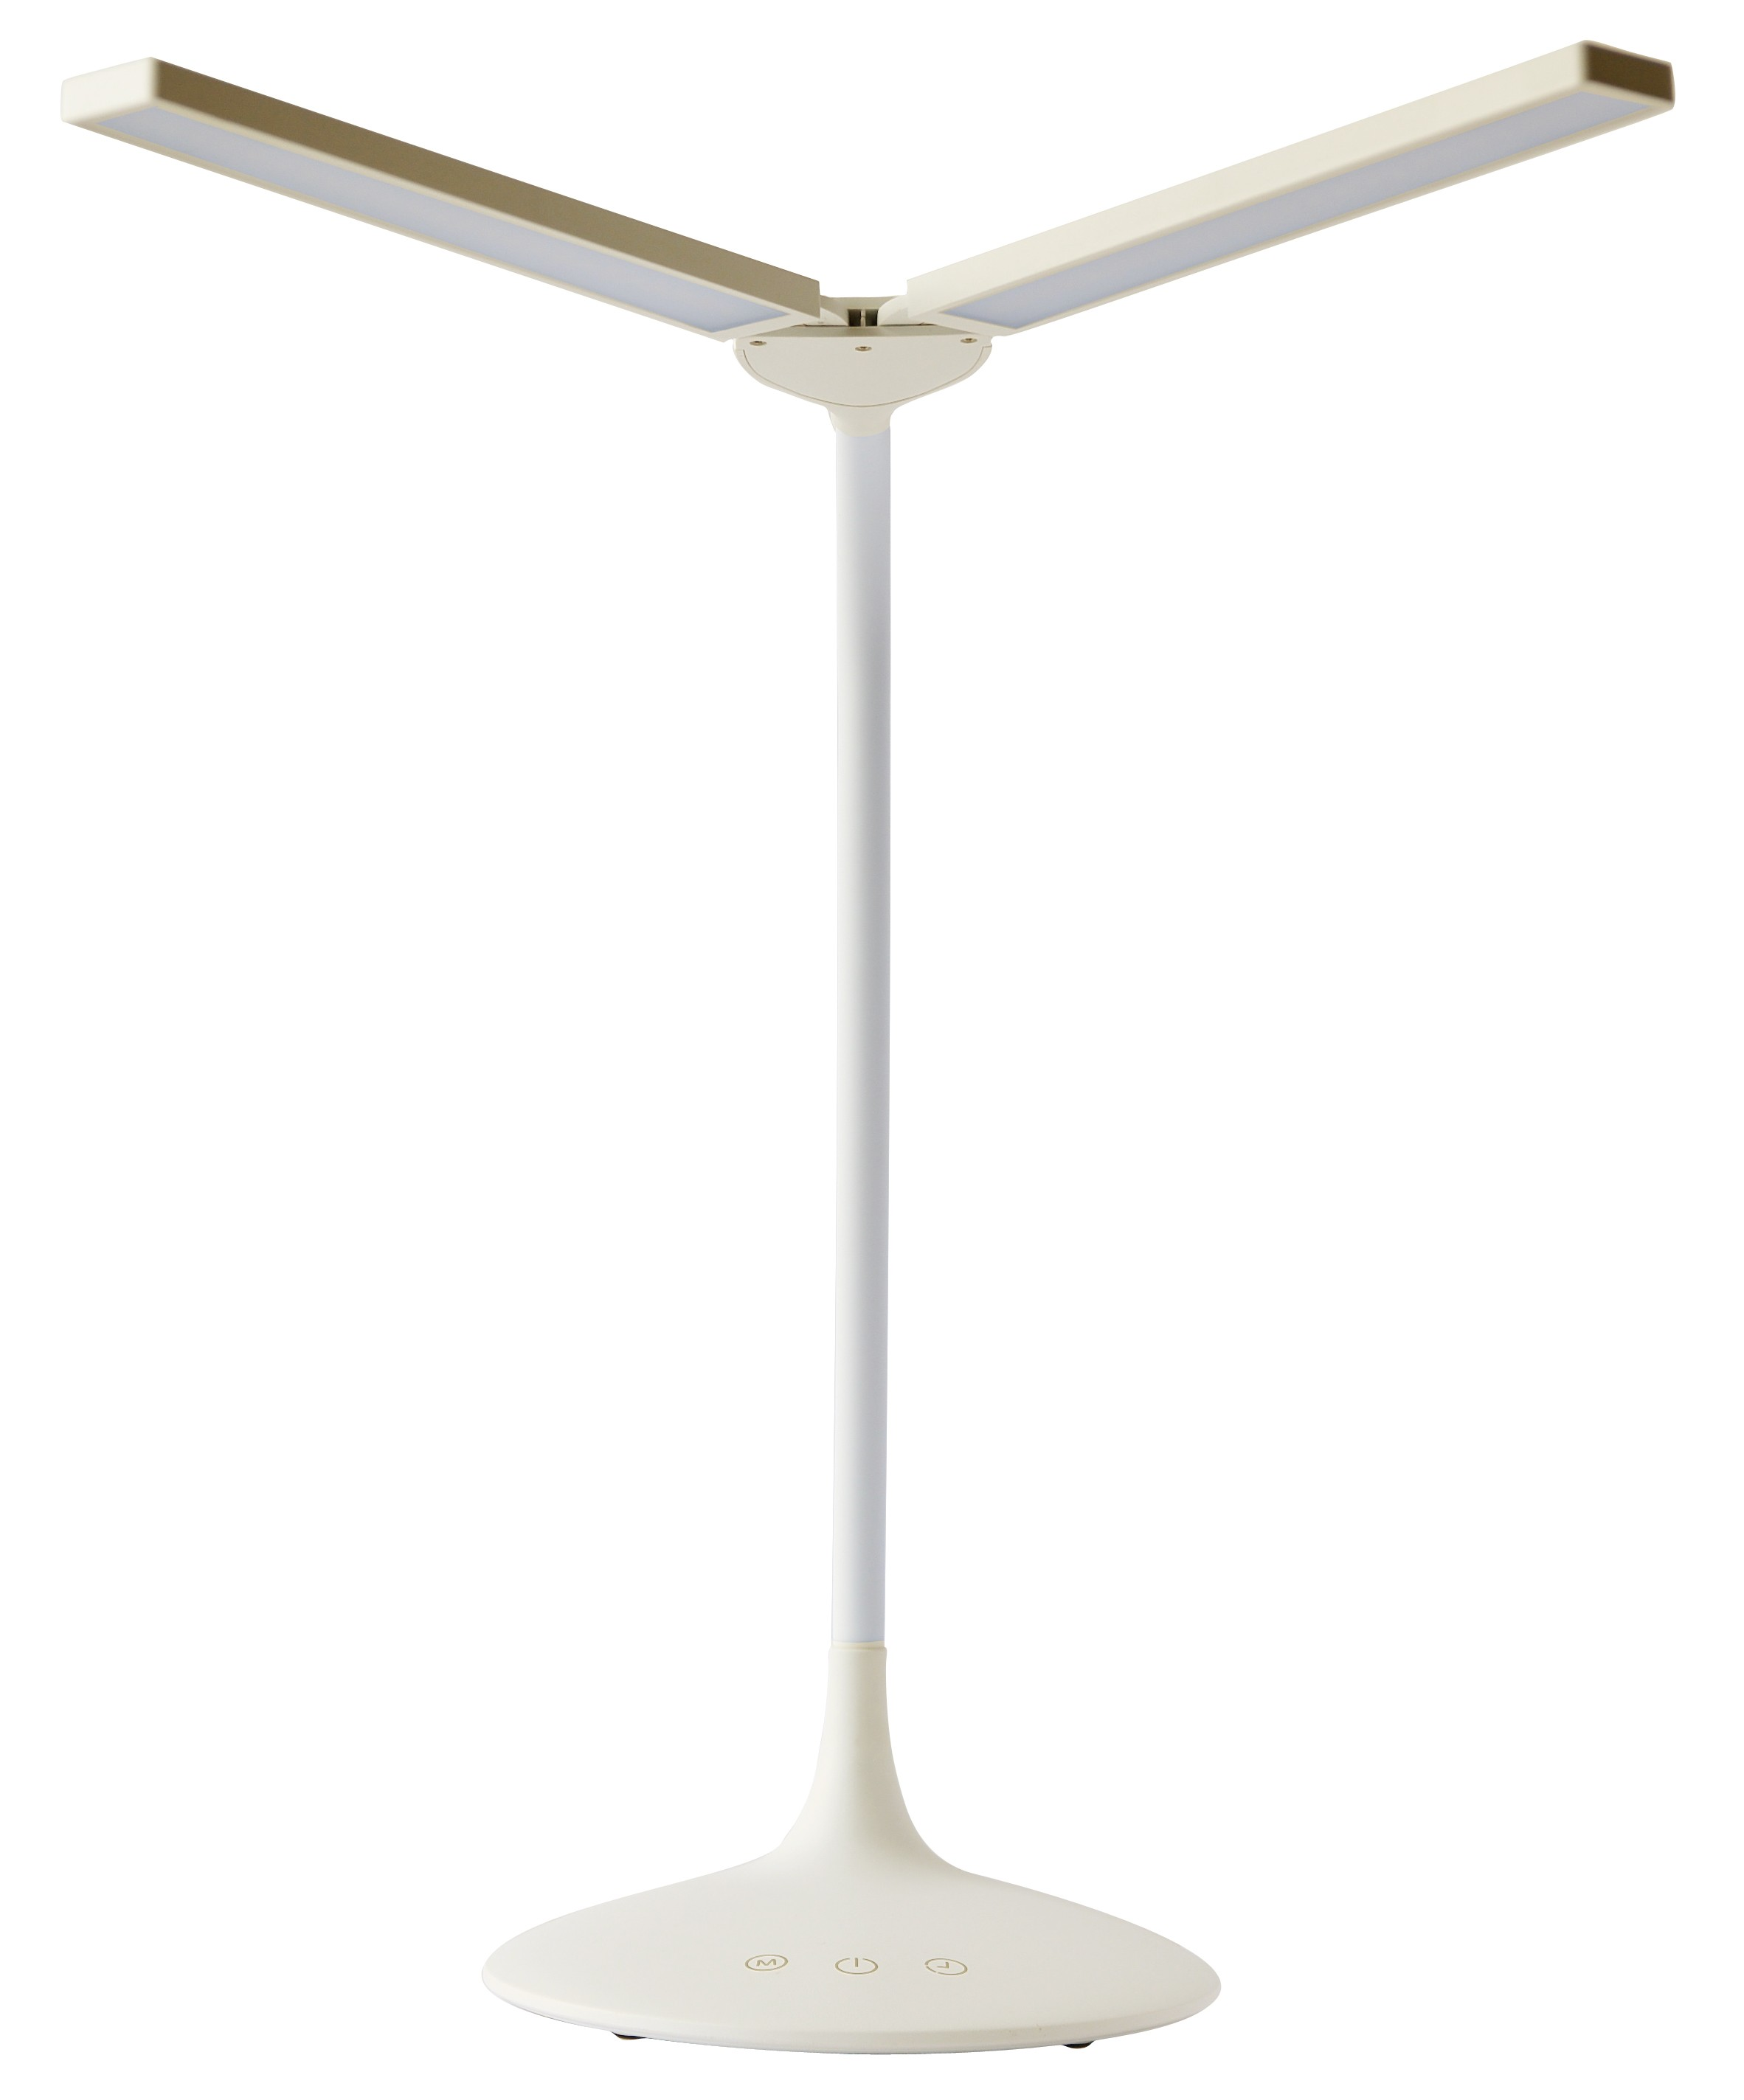 TB-03 Butterfly LED Desk Lamp - ORIGIN